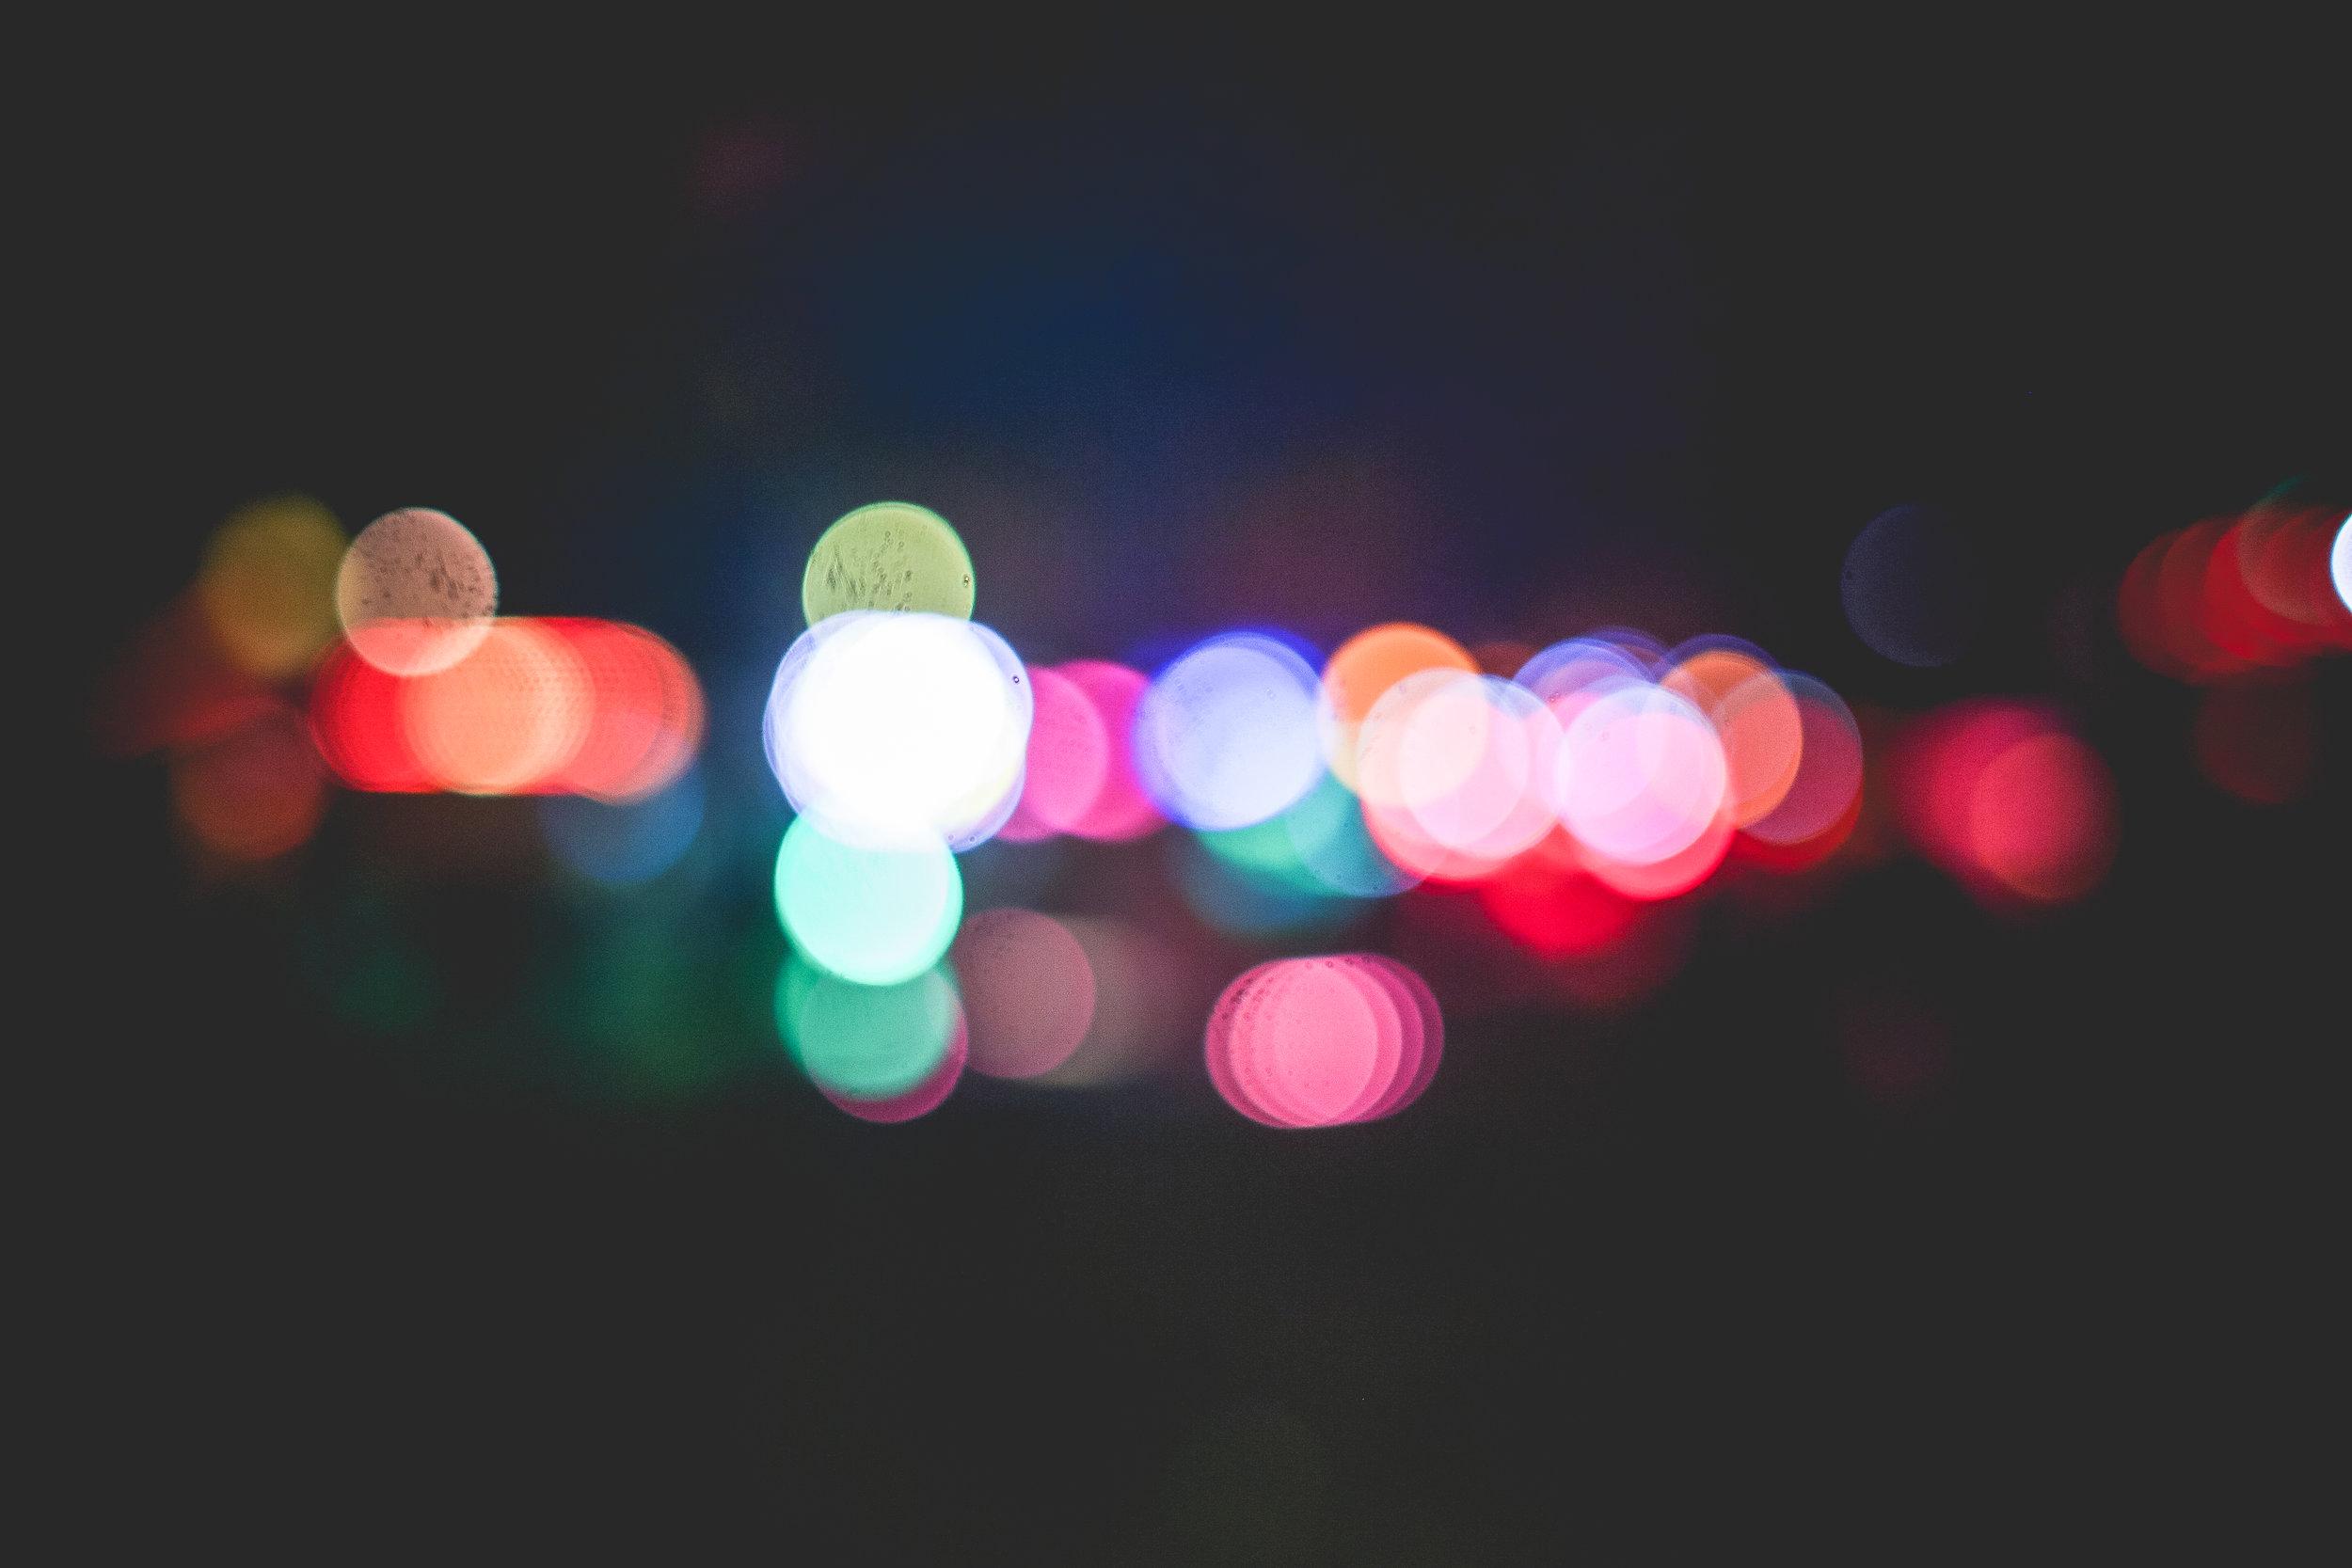 pexels-photo-225225.jpeg